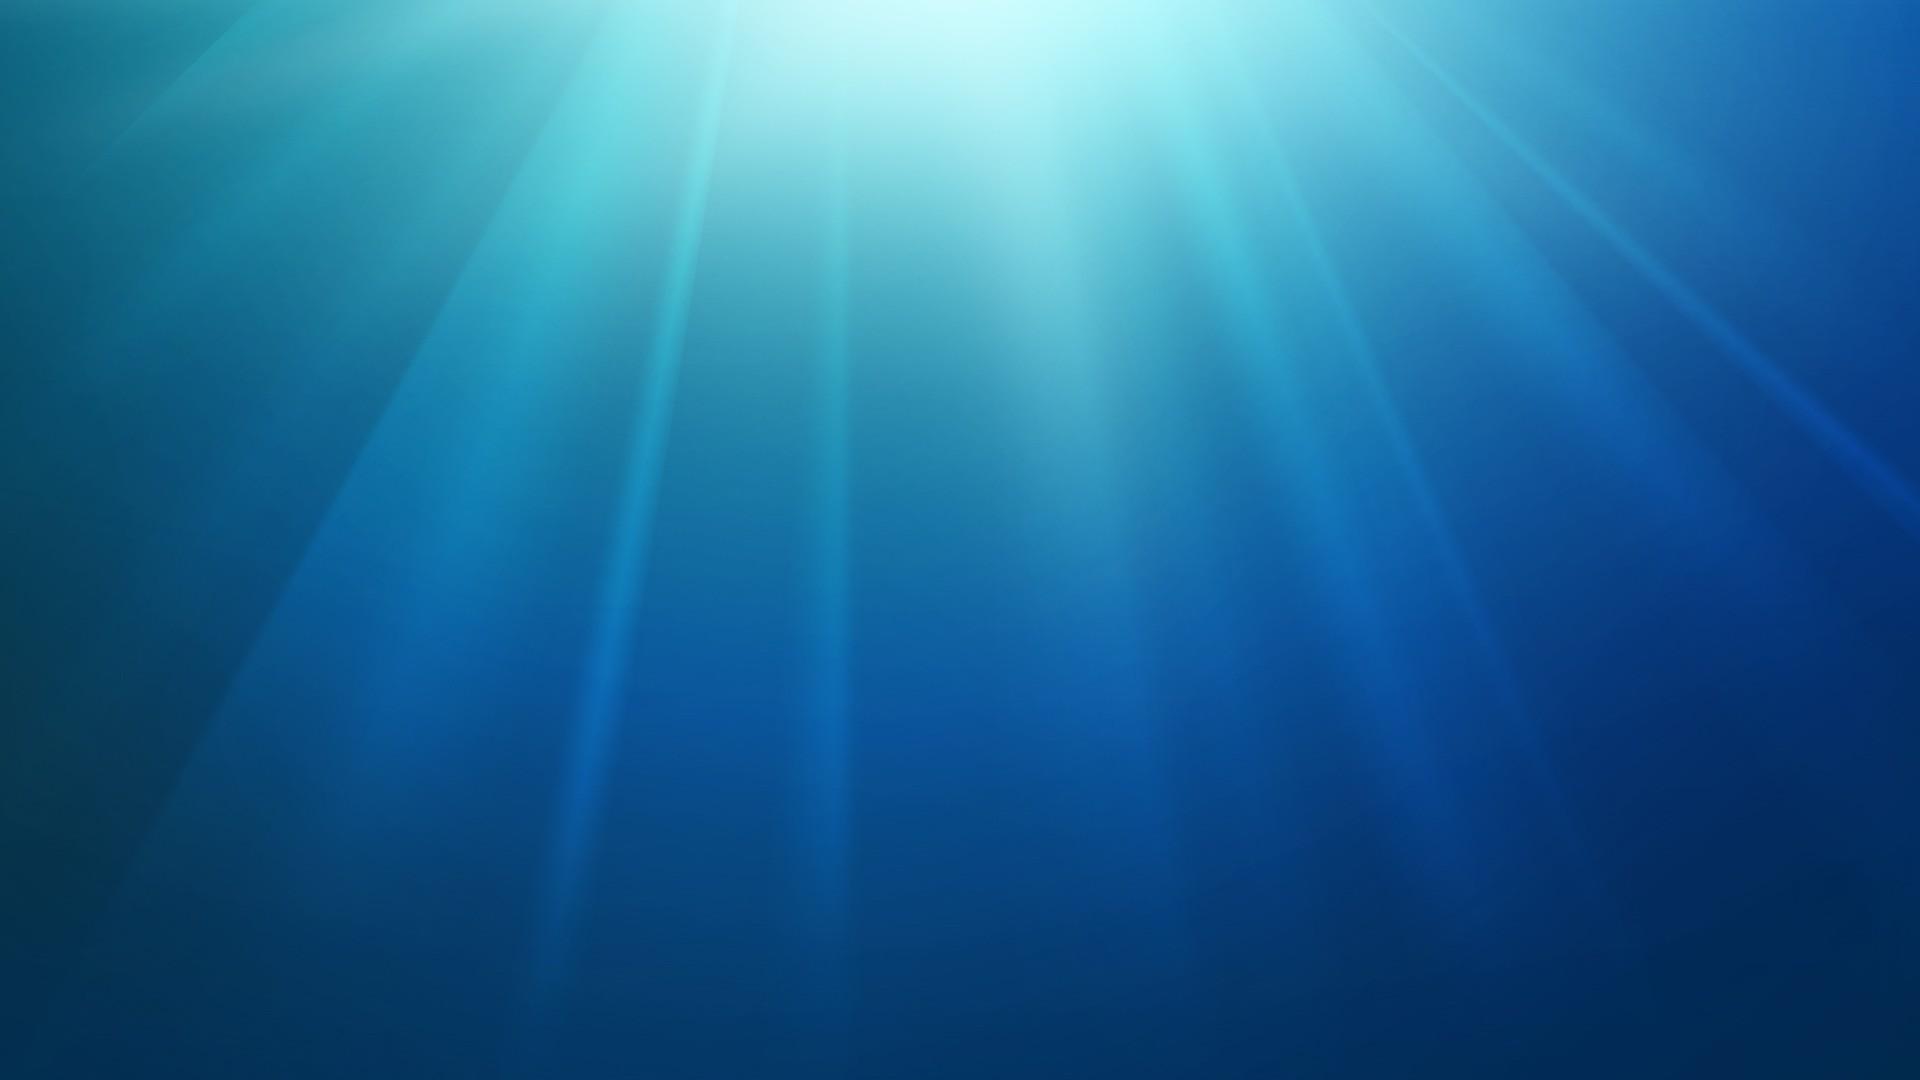 Rays of light under water wallpaper Wallpaper Wide HD 1920x1080